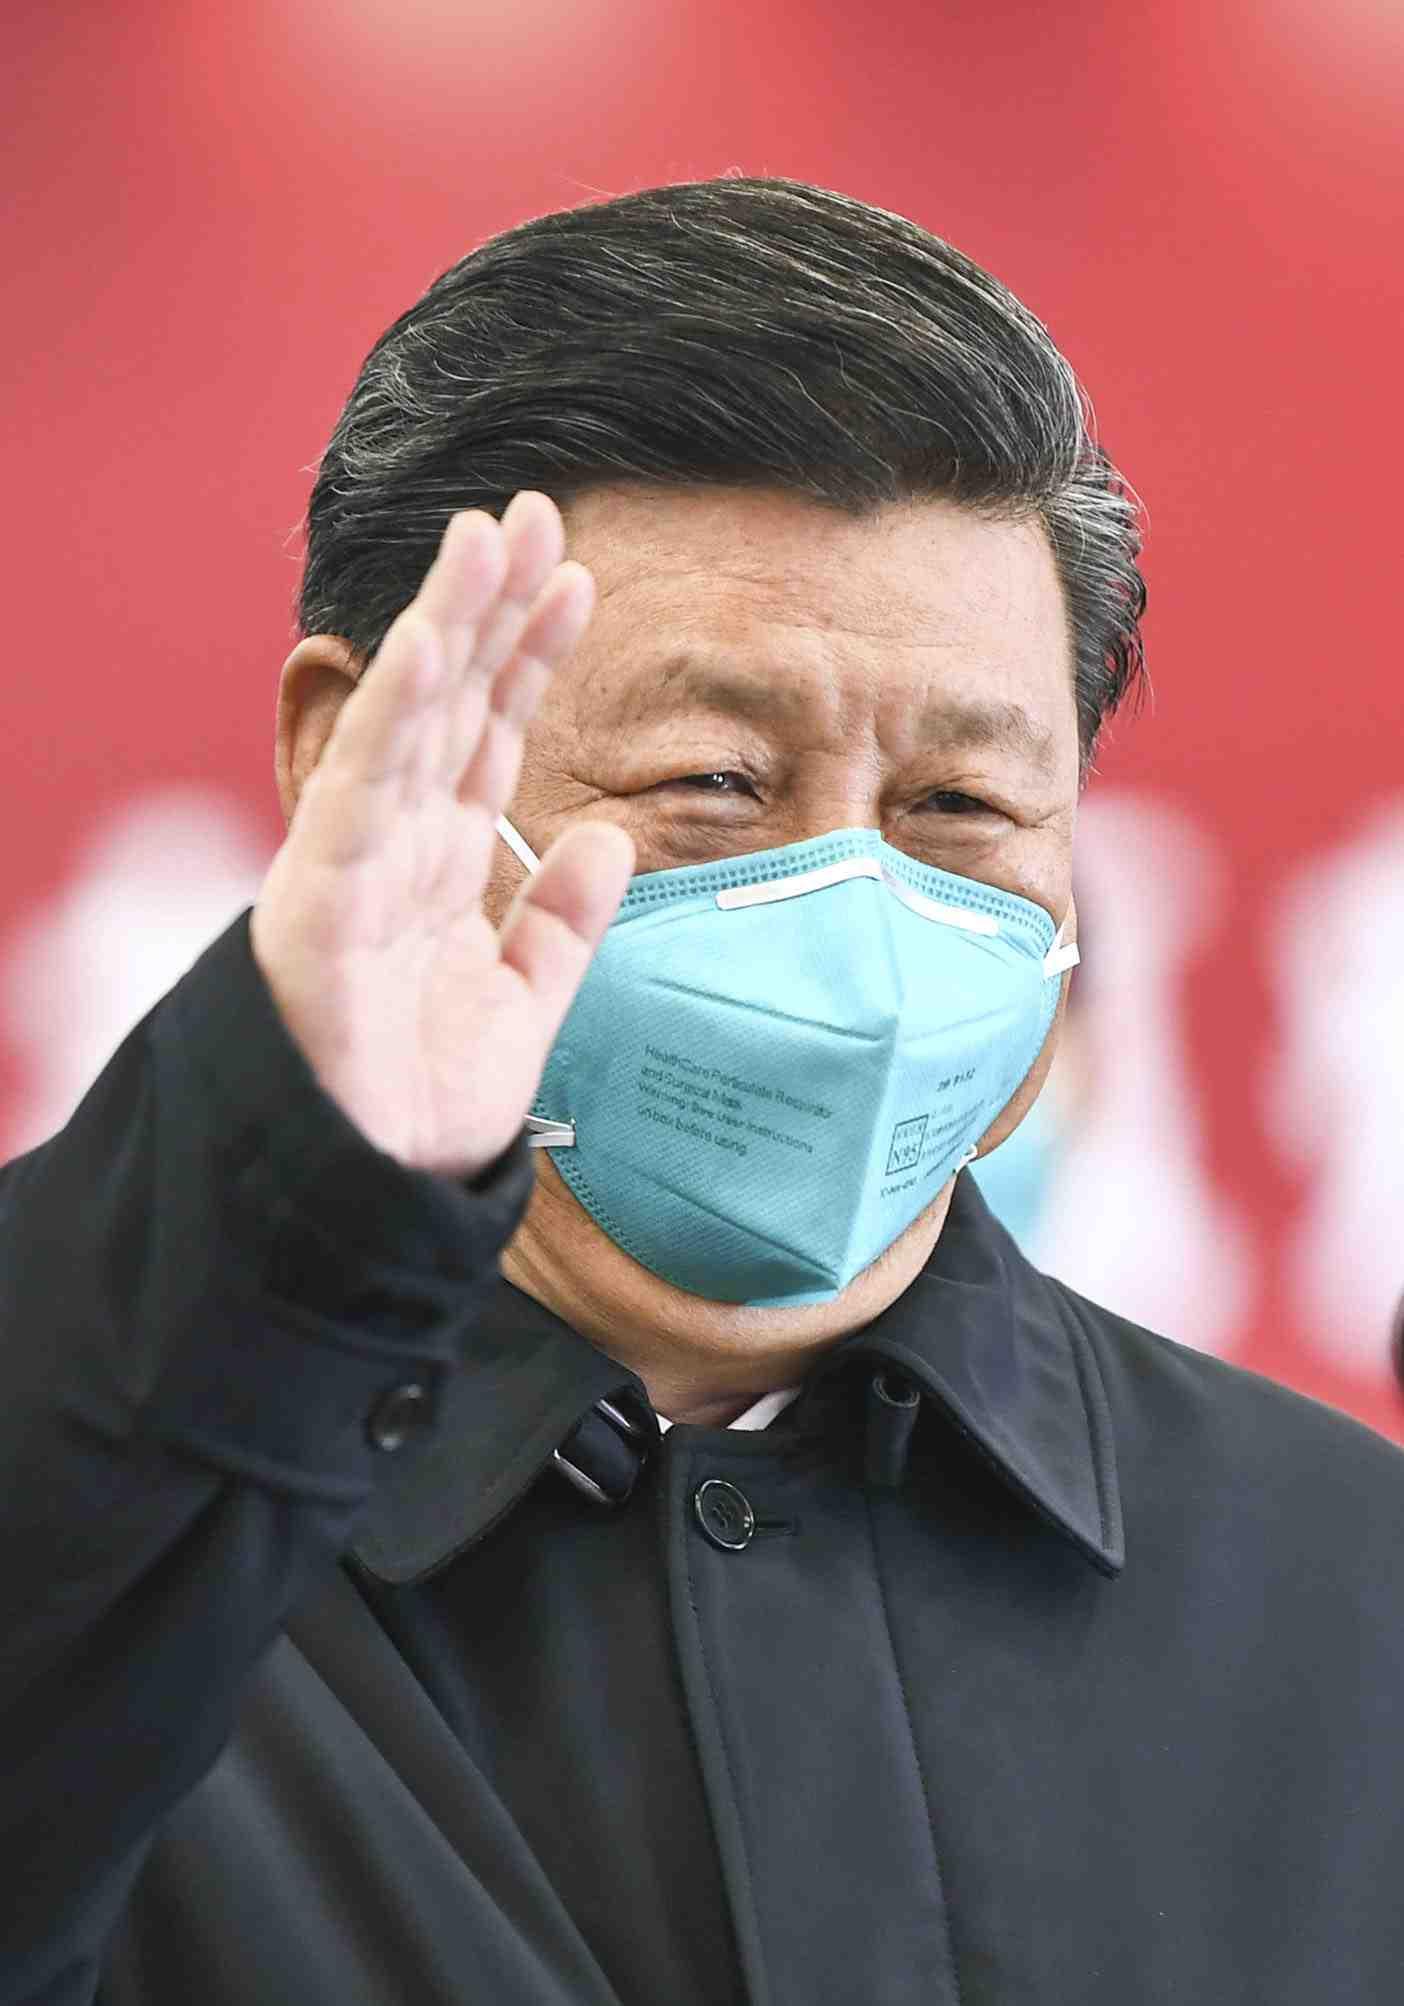 China Xi Jinping and Coronavirus 009